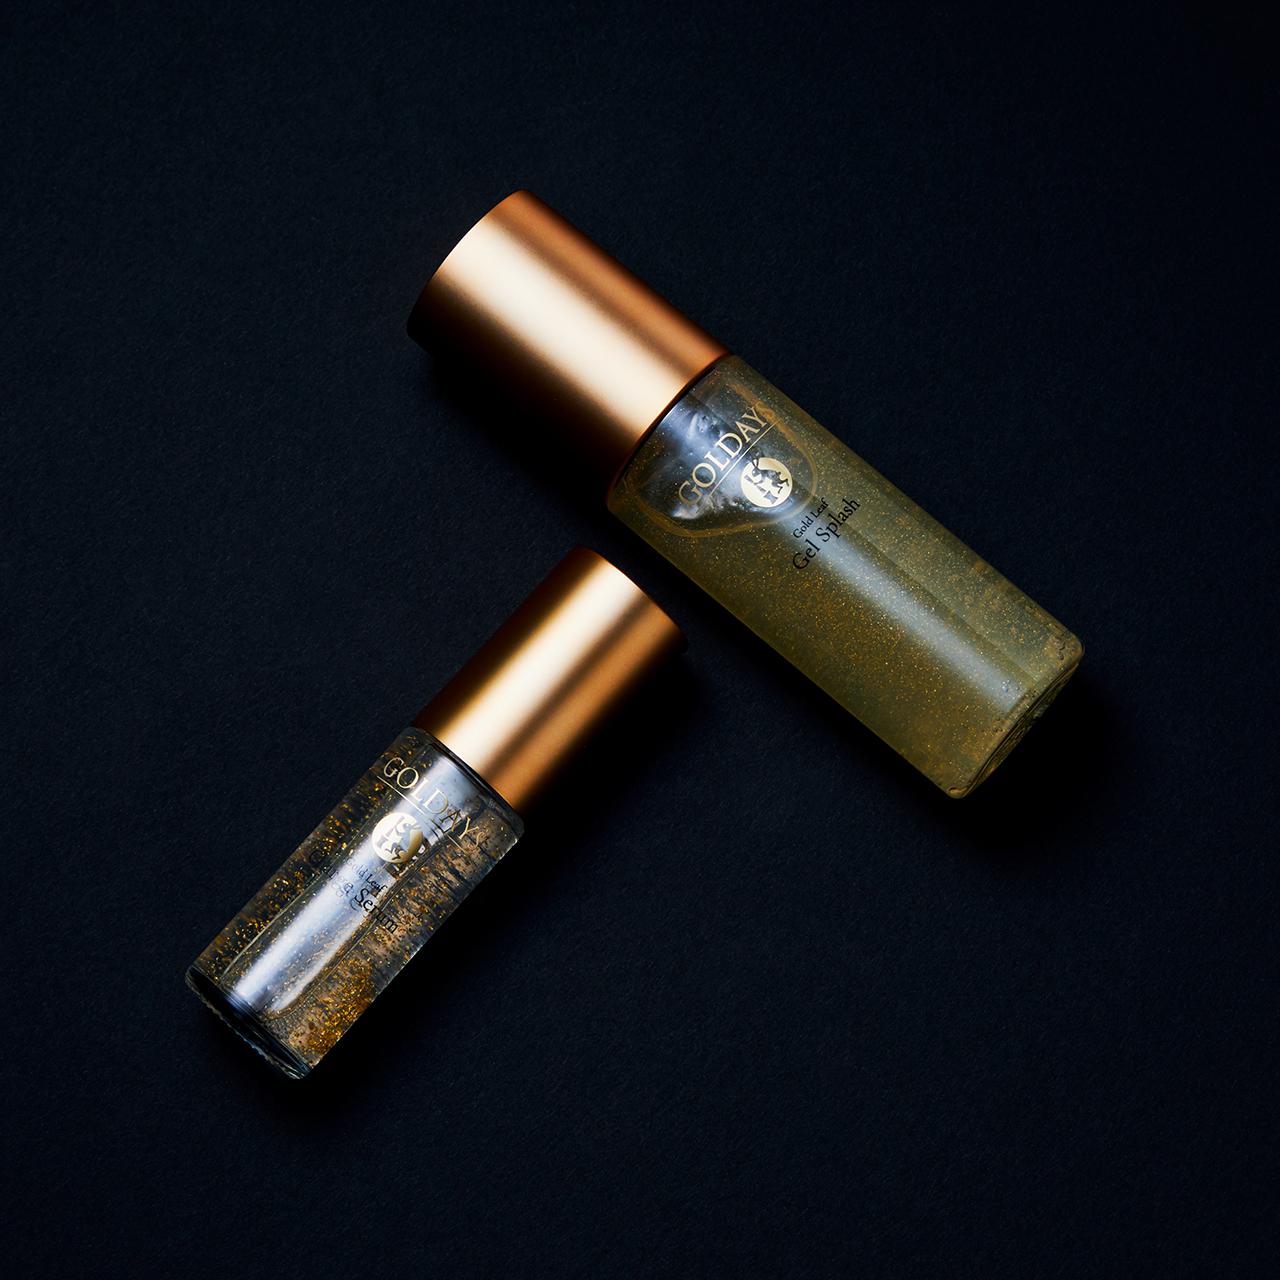 MAKANAI COSMETICS (上から) ゴールデイズ 金箔ジェルスプラッシュ 100㎖ ¥12,000、同チャージセラム 30㎖ ¥10,000 (10/1発売)